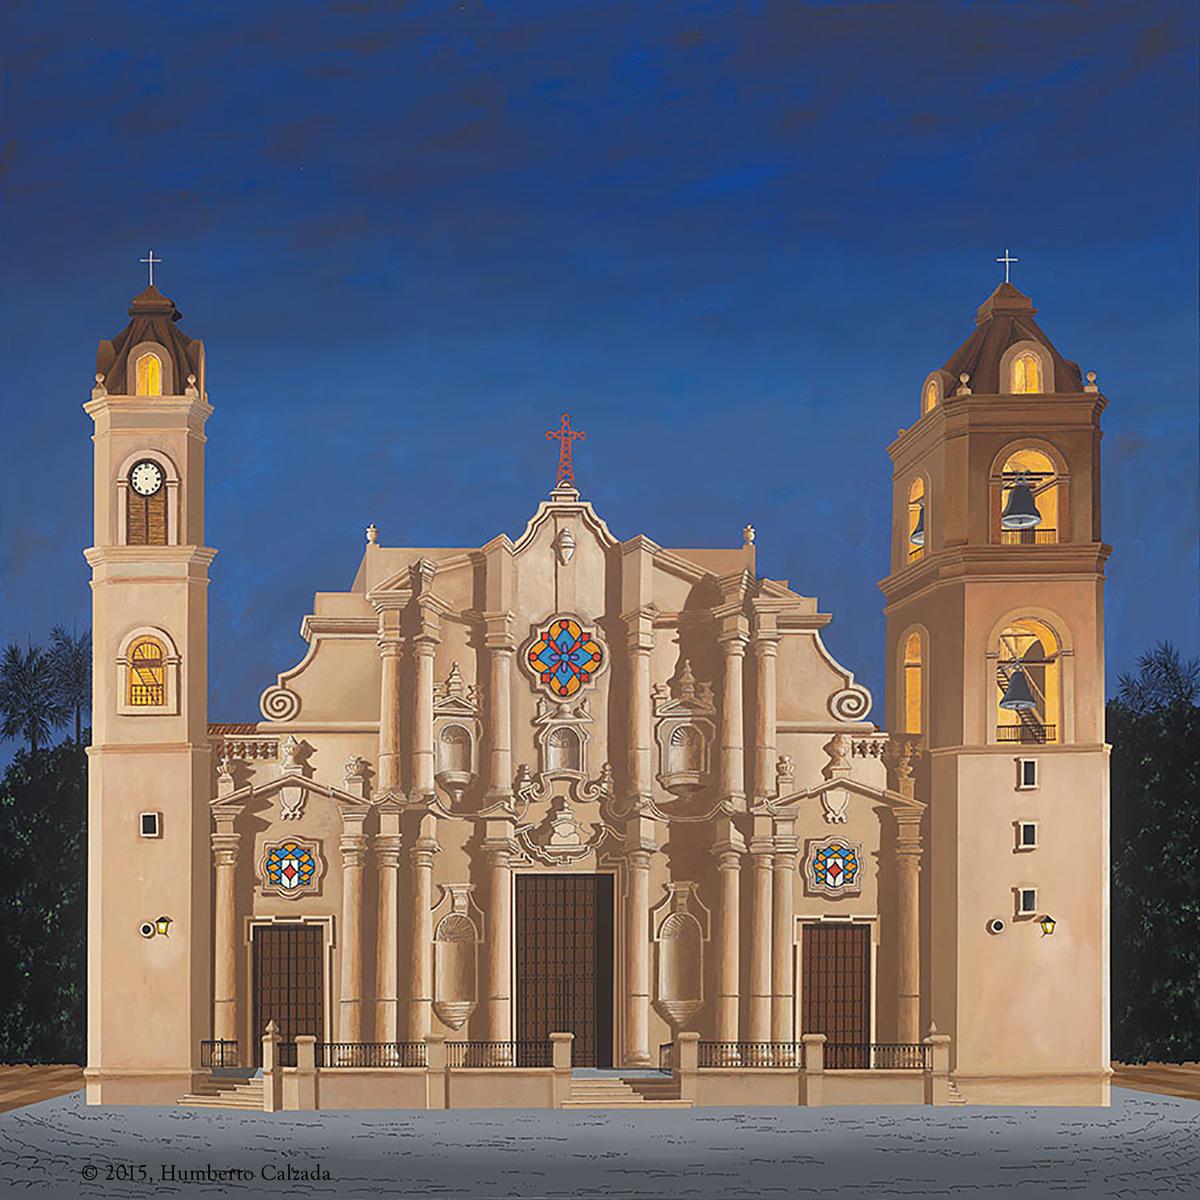 Catedral de La Habana (Havana Cathedral) Acrylic on Canvas, 1m x 1m, 2015